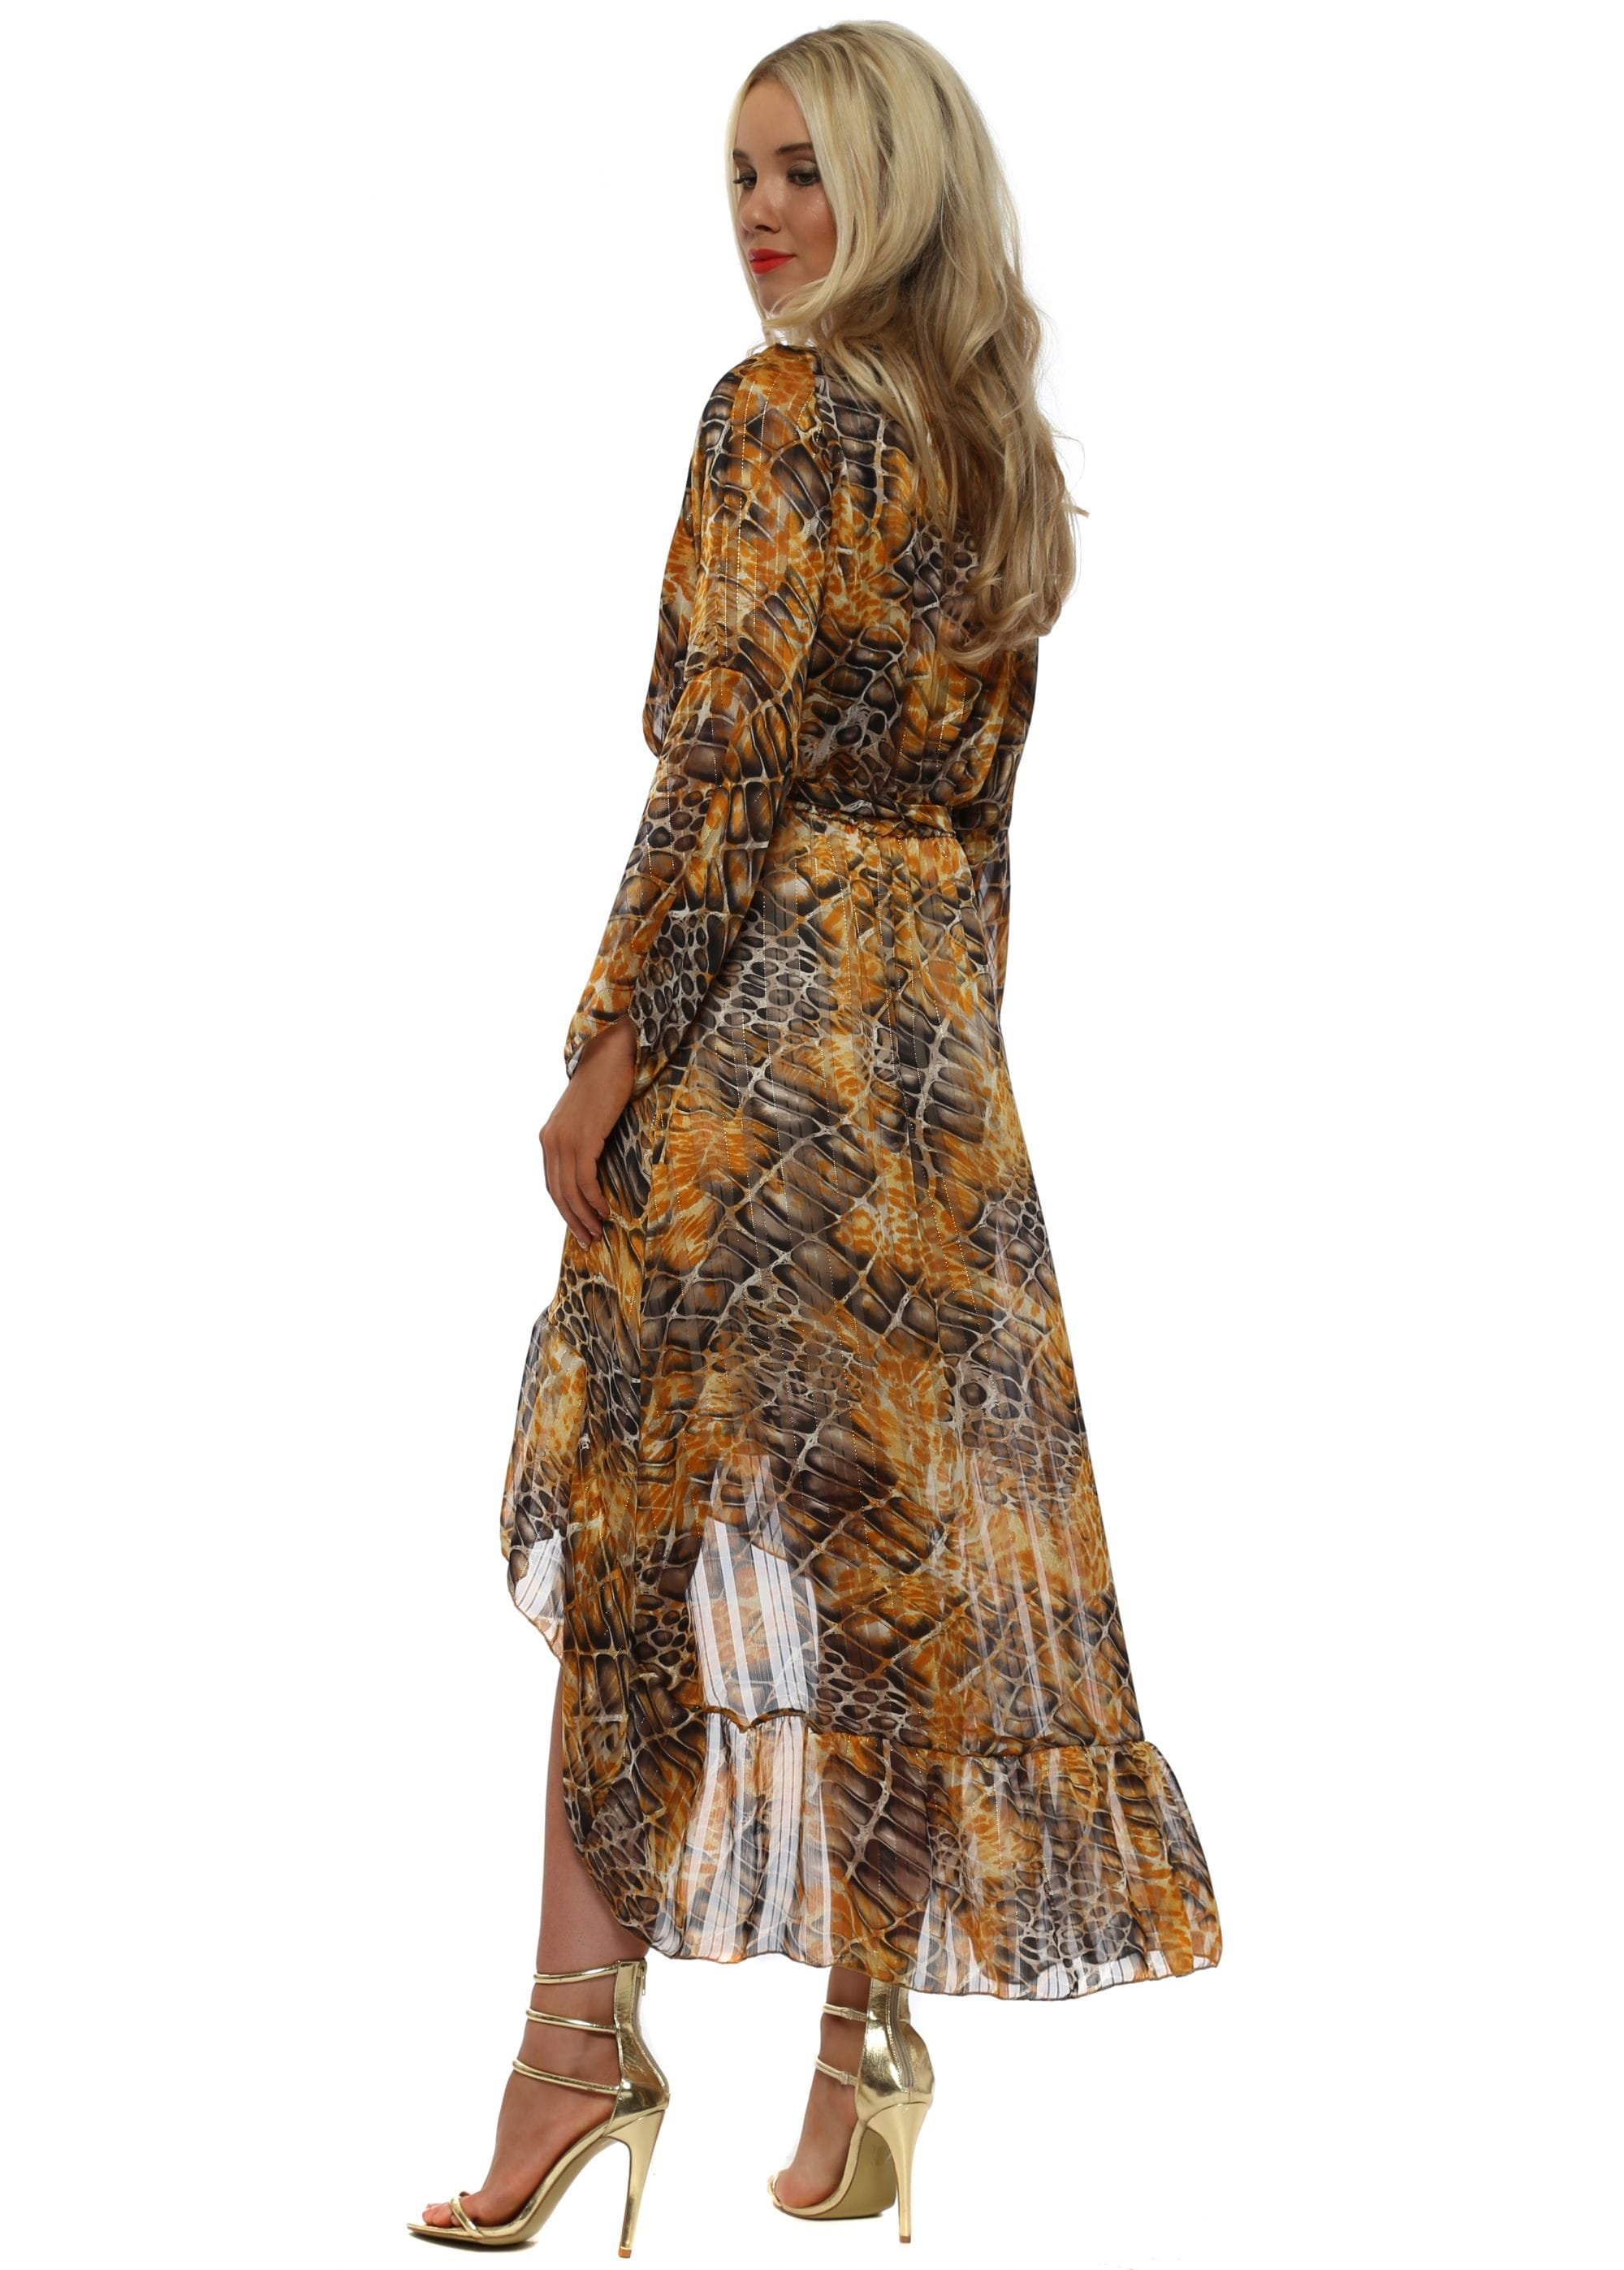 Amber Moc Croc Print High Low Wrap Dress